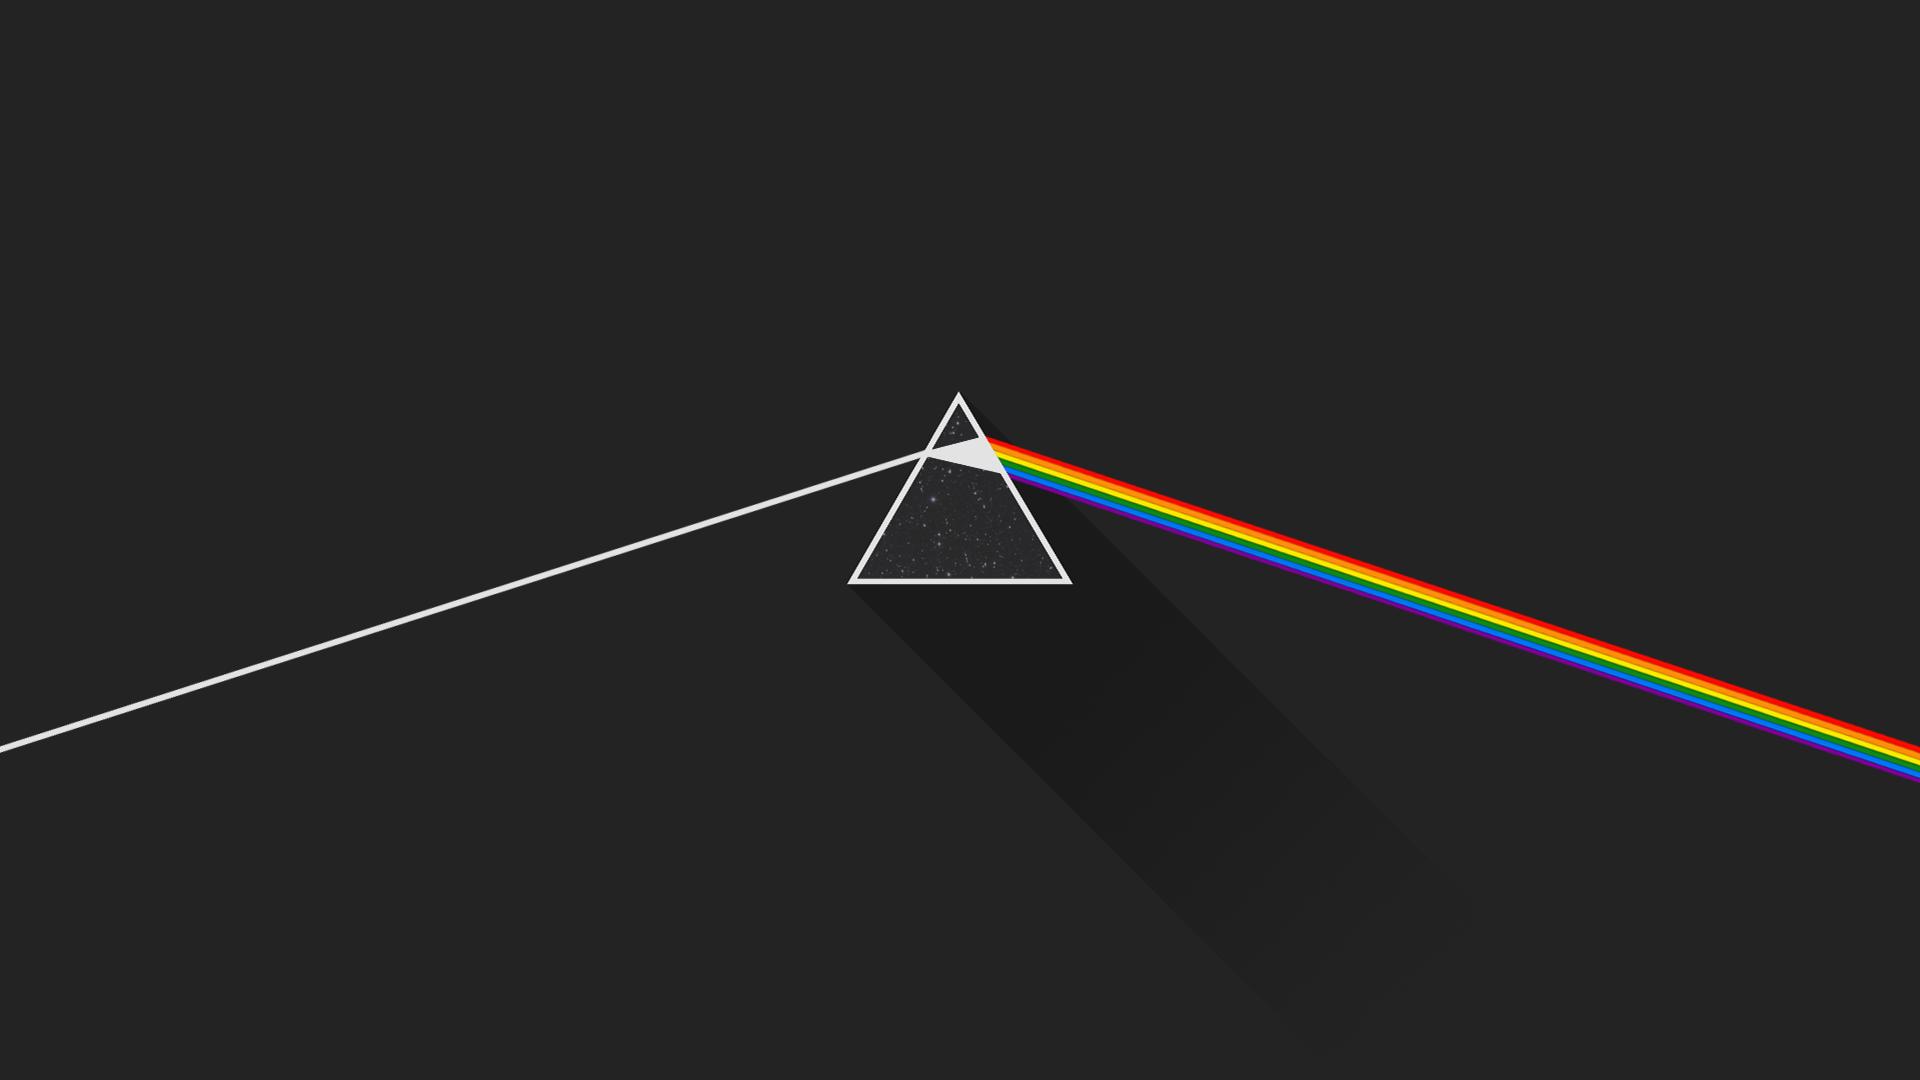 pinkfloydprismwallpaper.png 1,920×1,080 pixels Musica